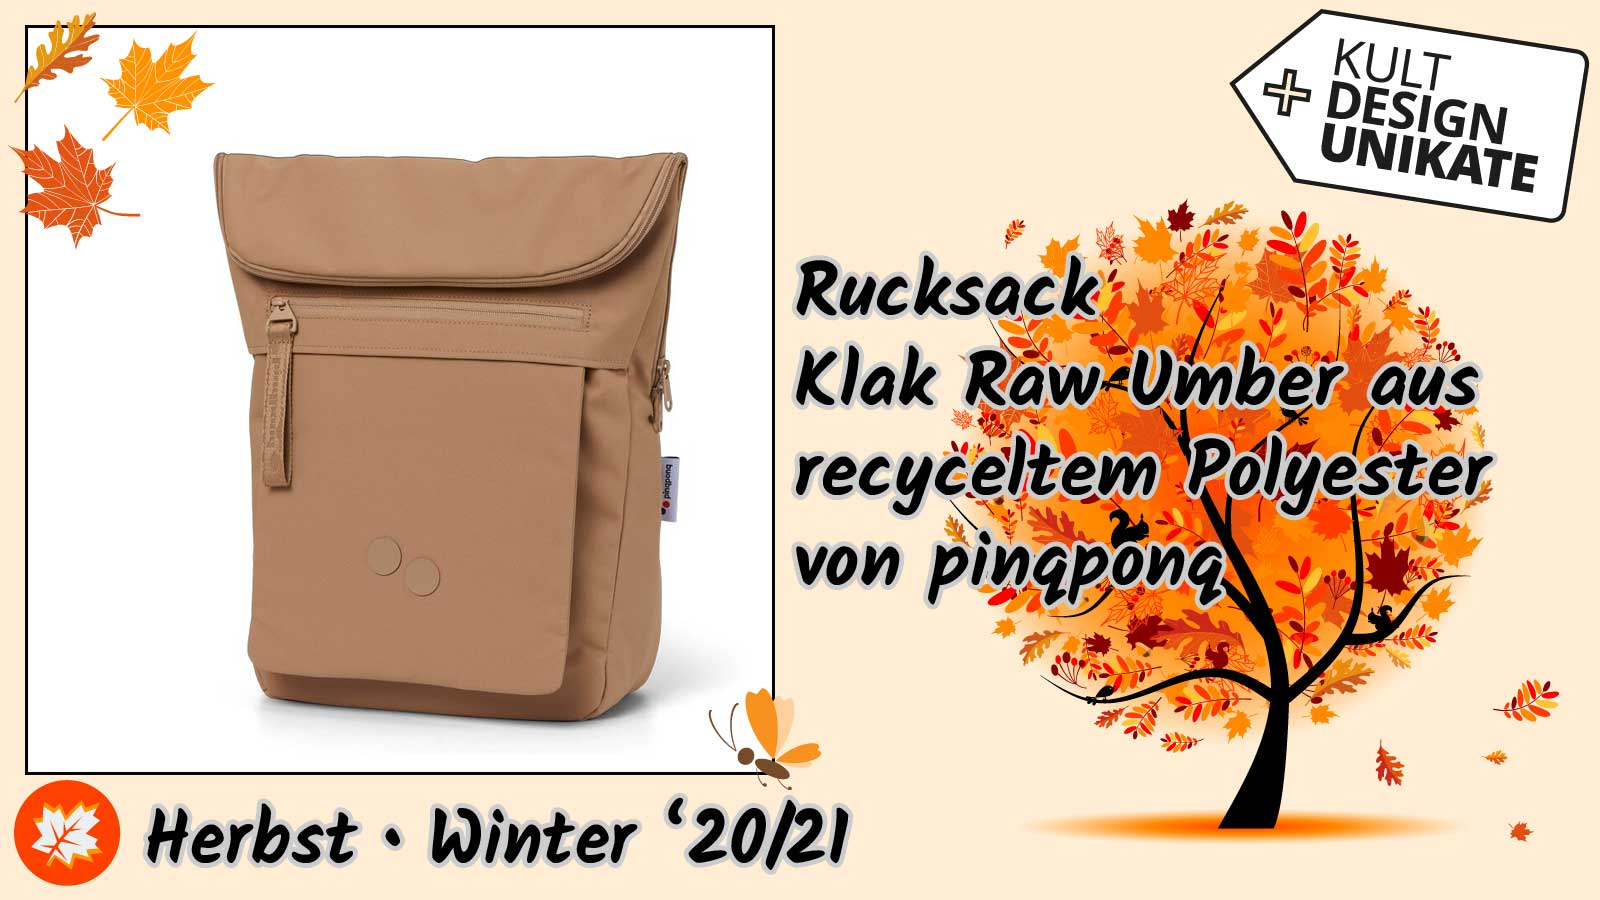 pinqponq-Rucksack-Klak-Raw-Umber